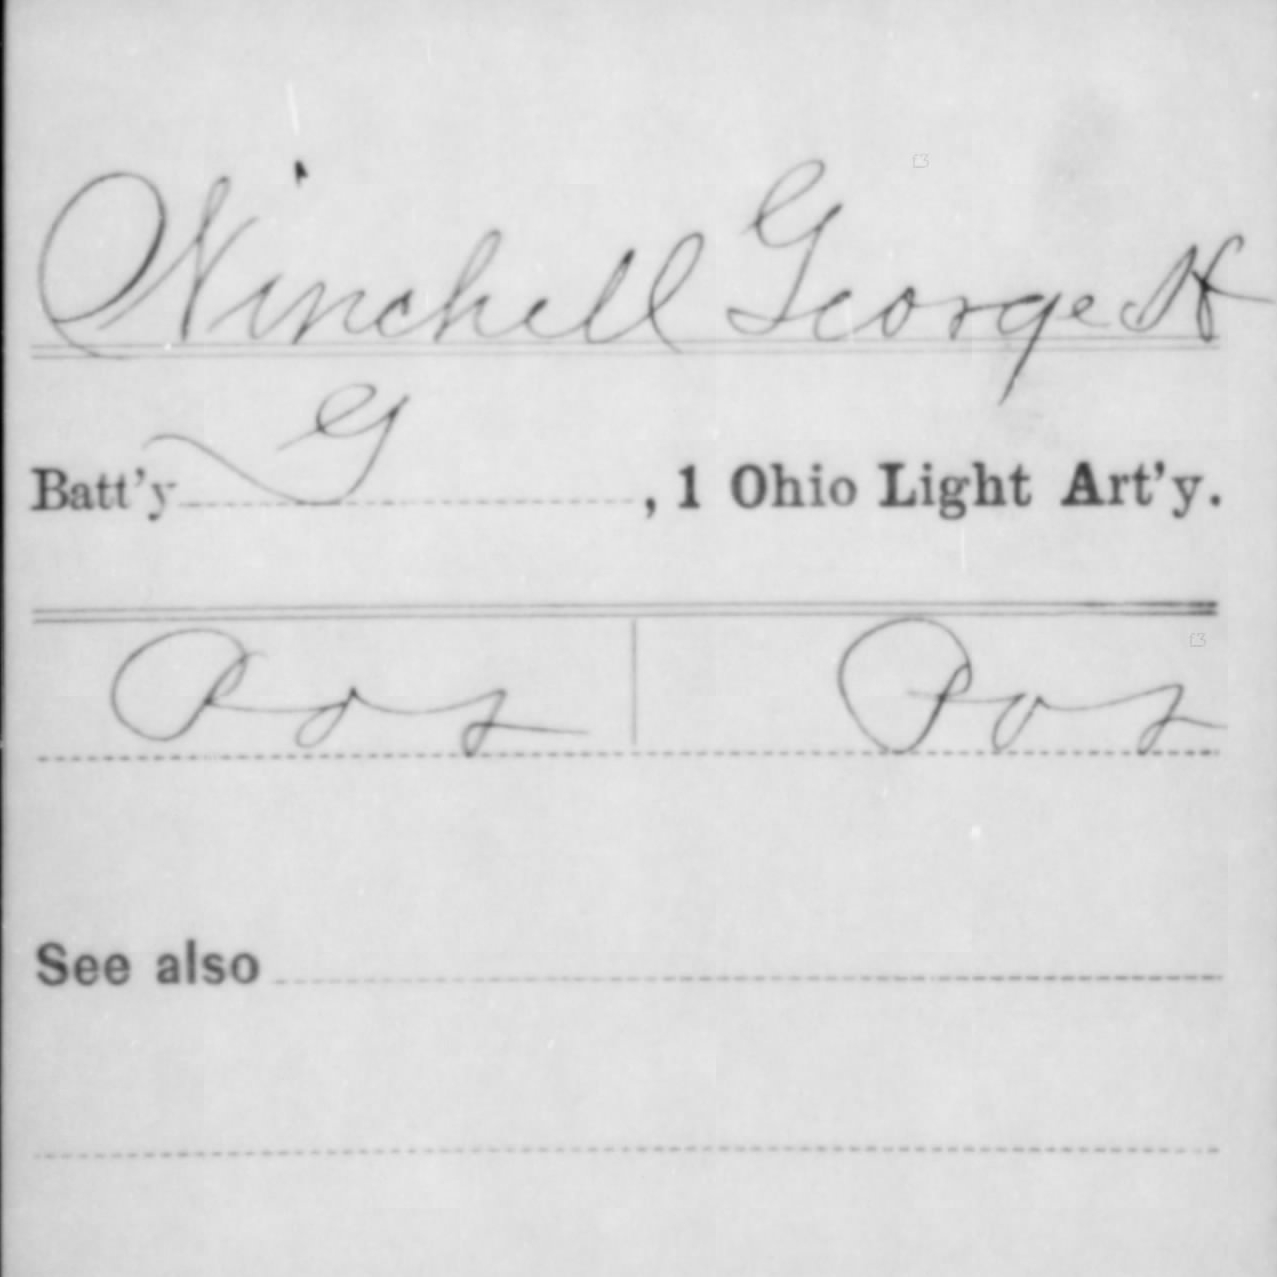 Pvt. George Winchell, Battery G, 1st OH Light Artillery, USA